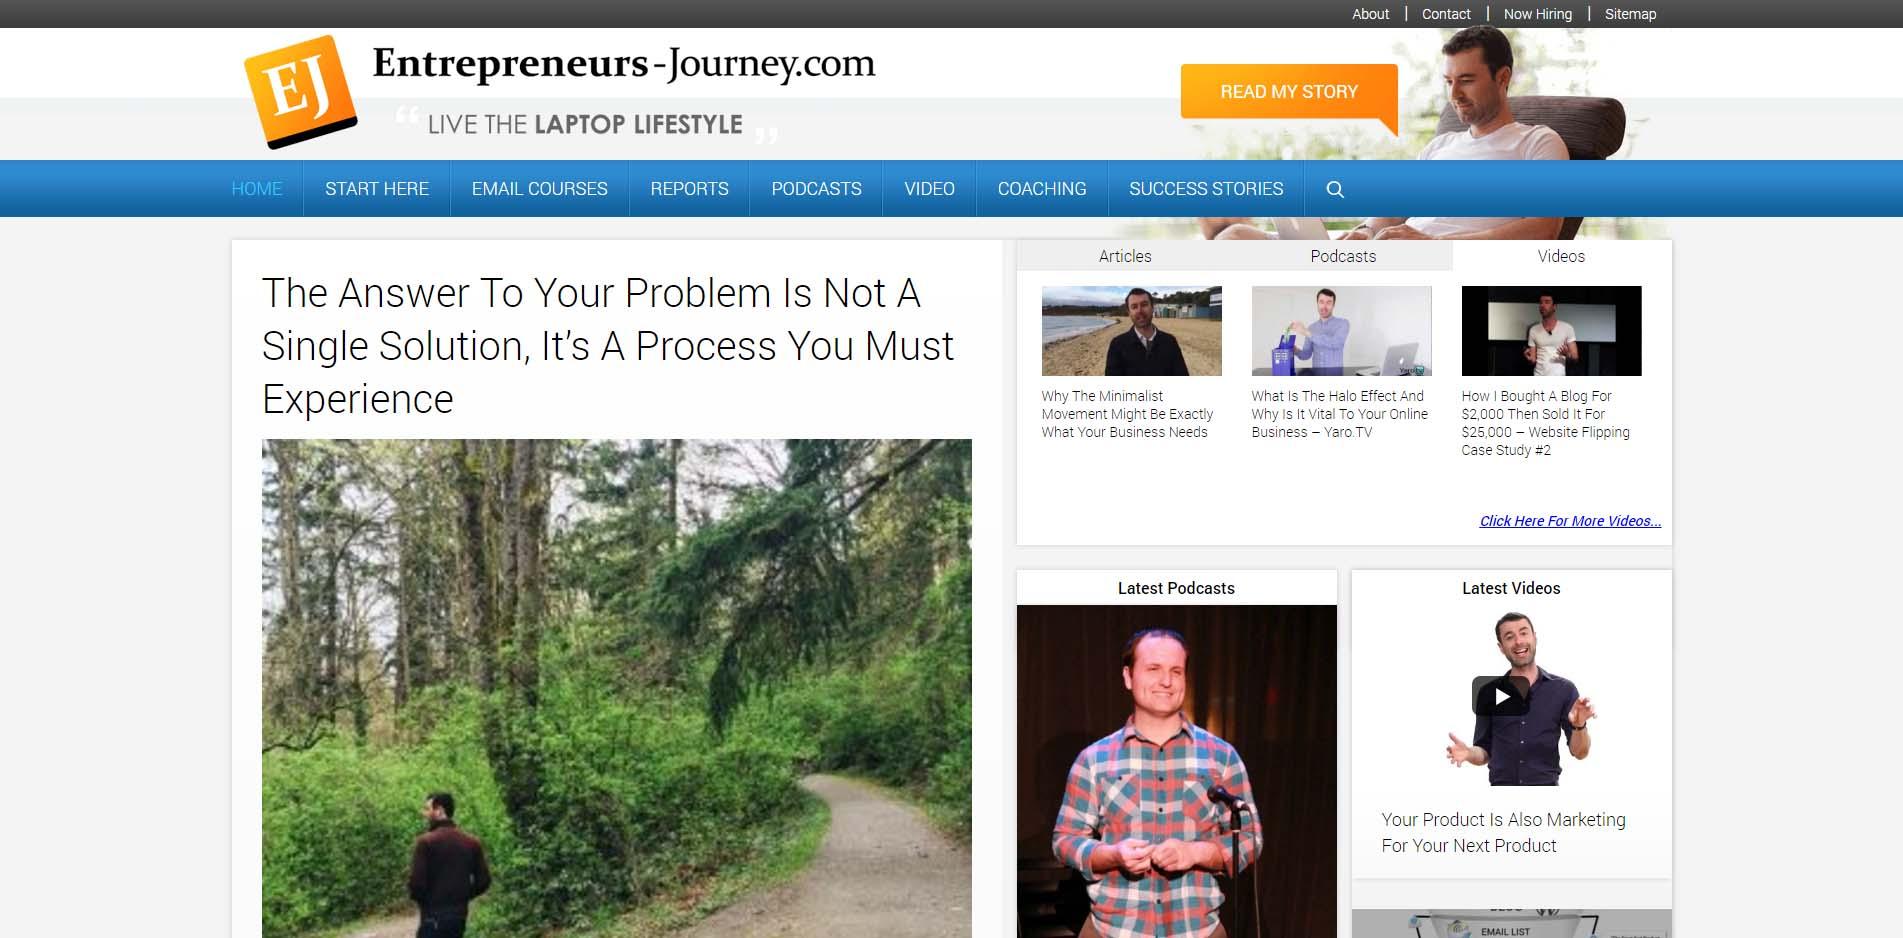 seo-blog-entrepreneurs-journey-com